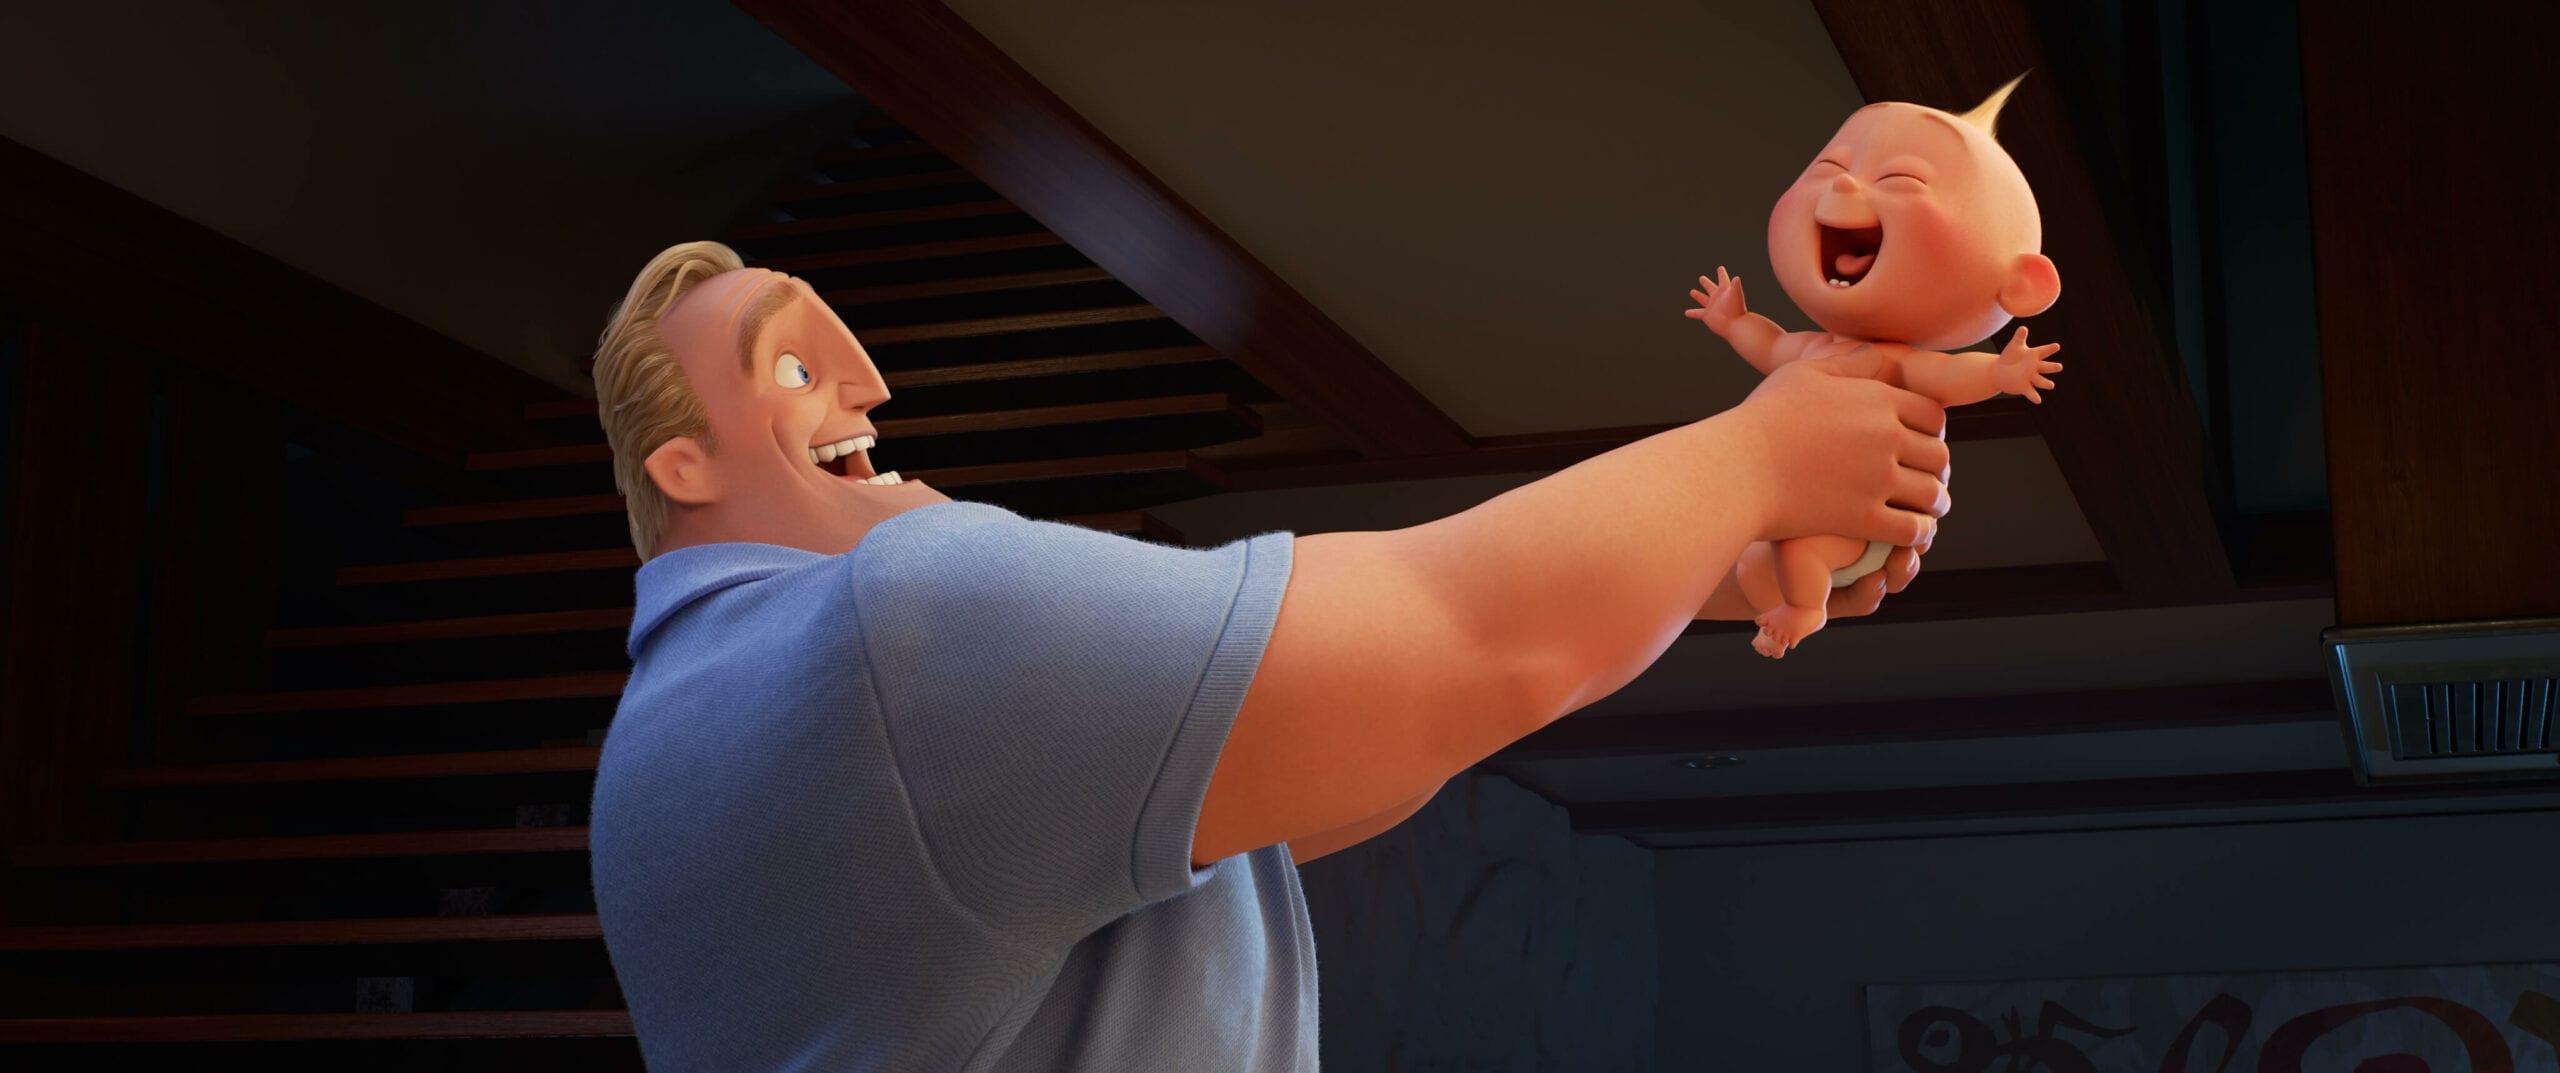 The Incredibles vs. Incredibles 2 - Geeks + Gamers